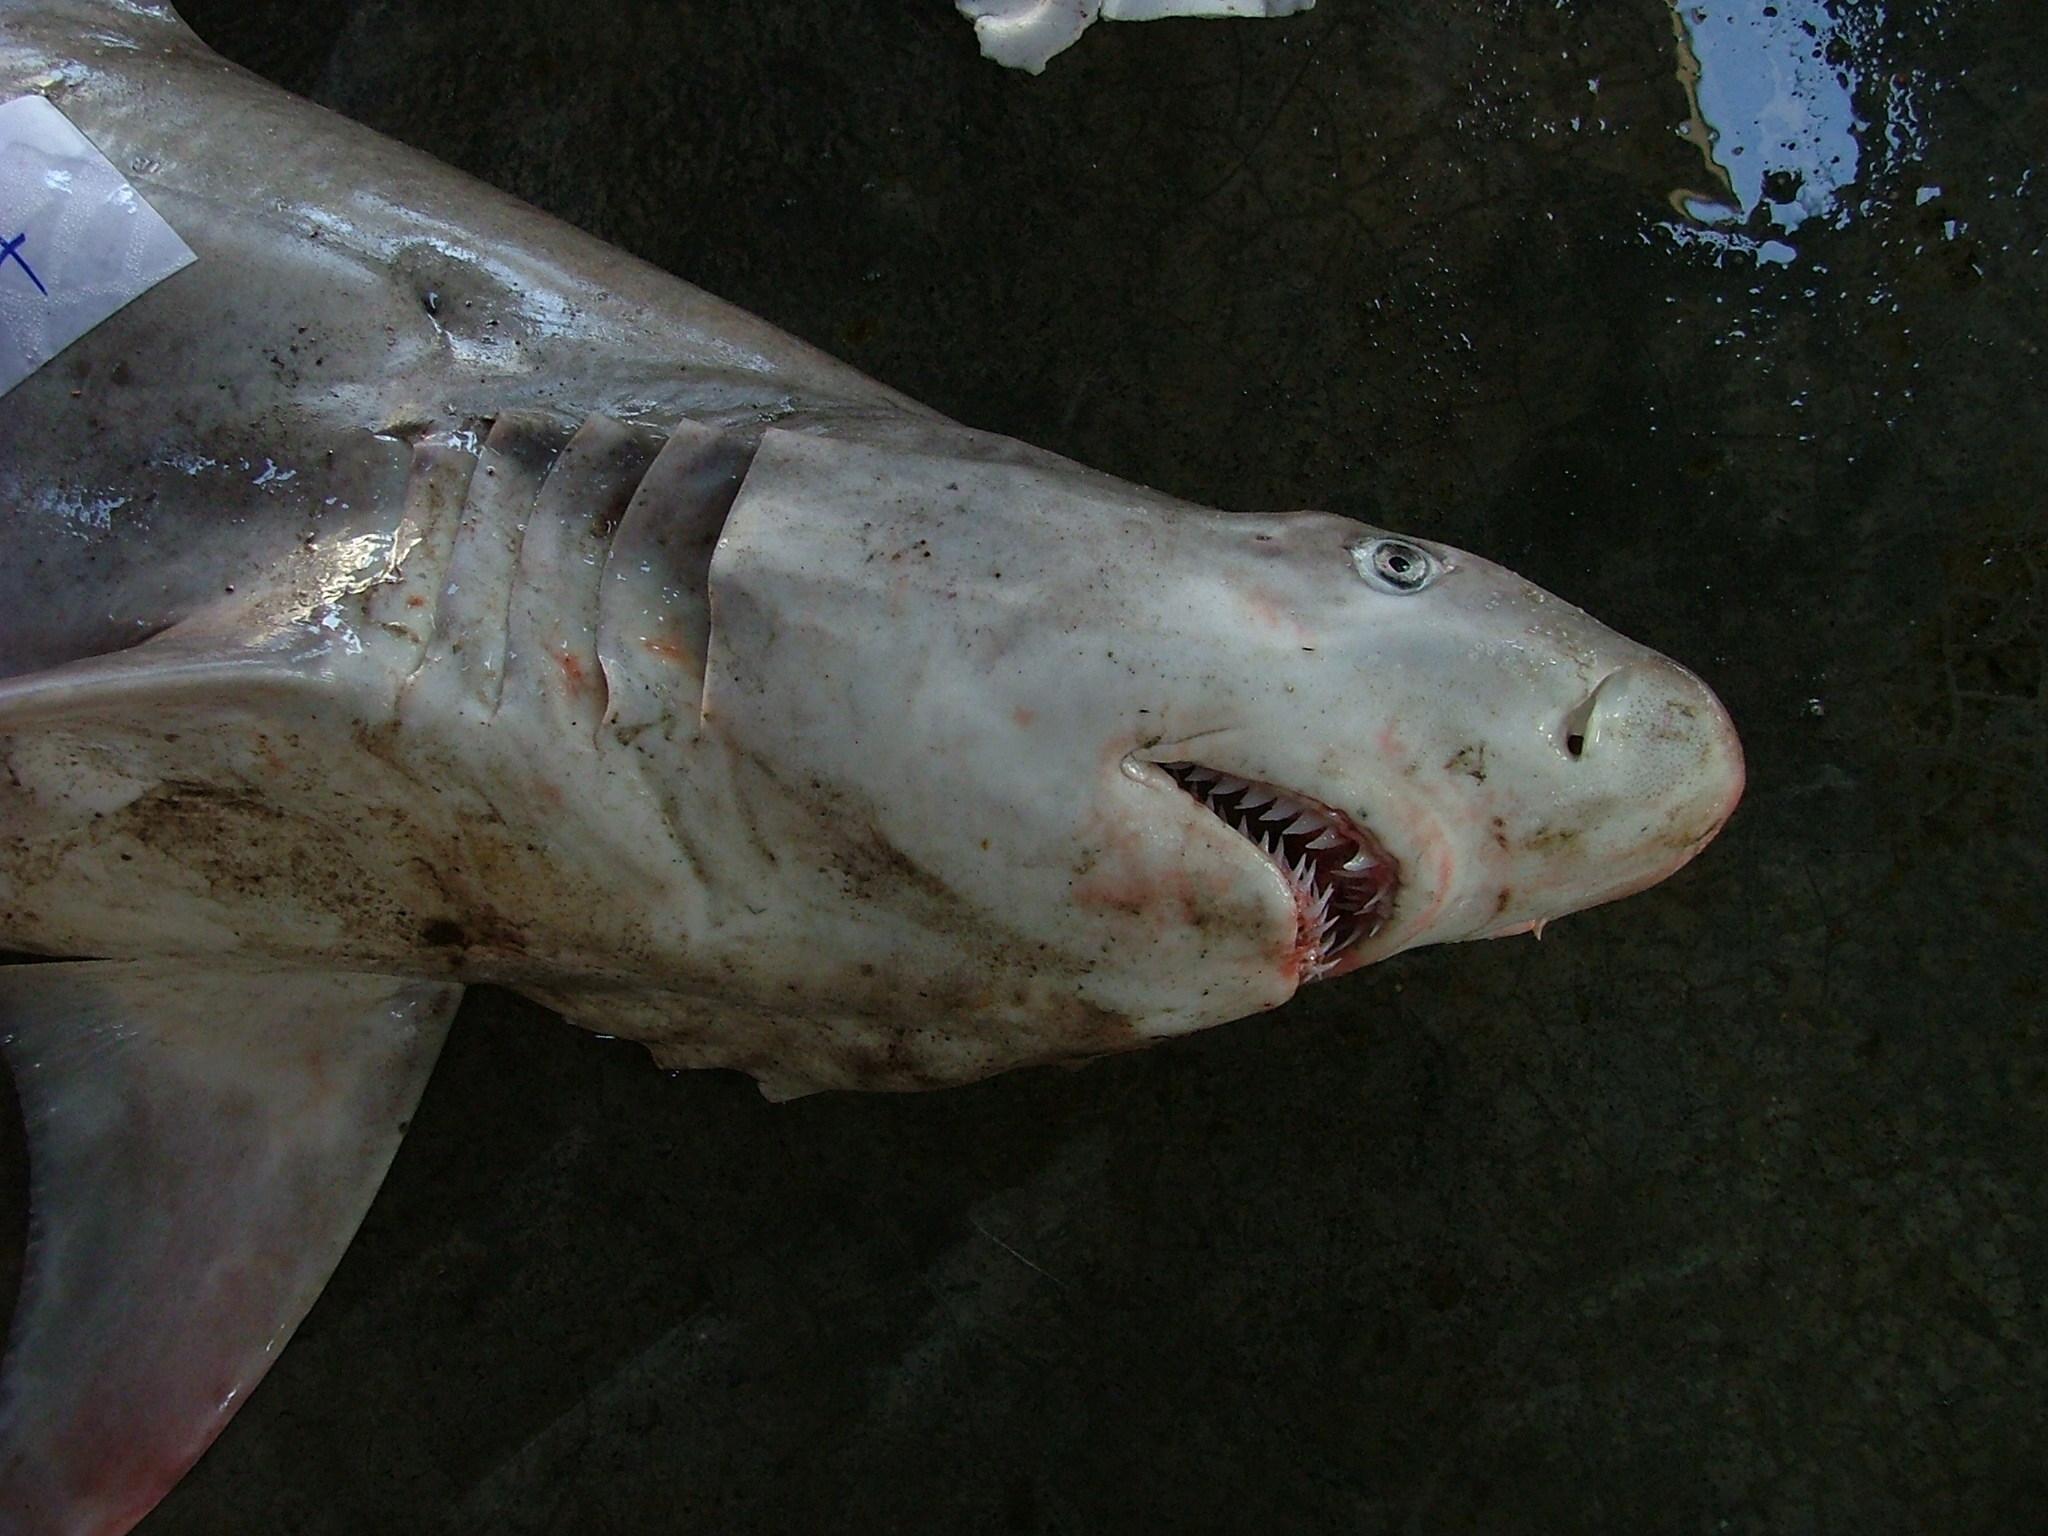 Image of Snaggletooth shark